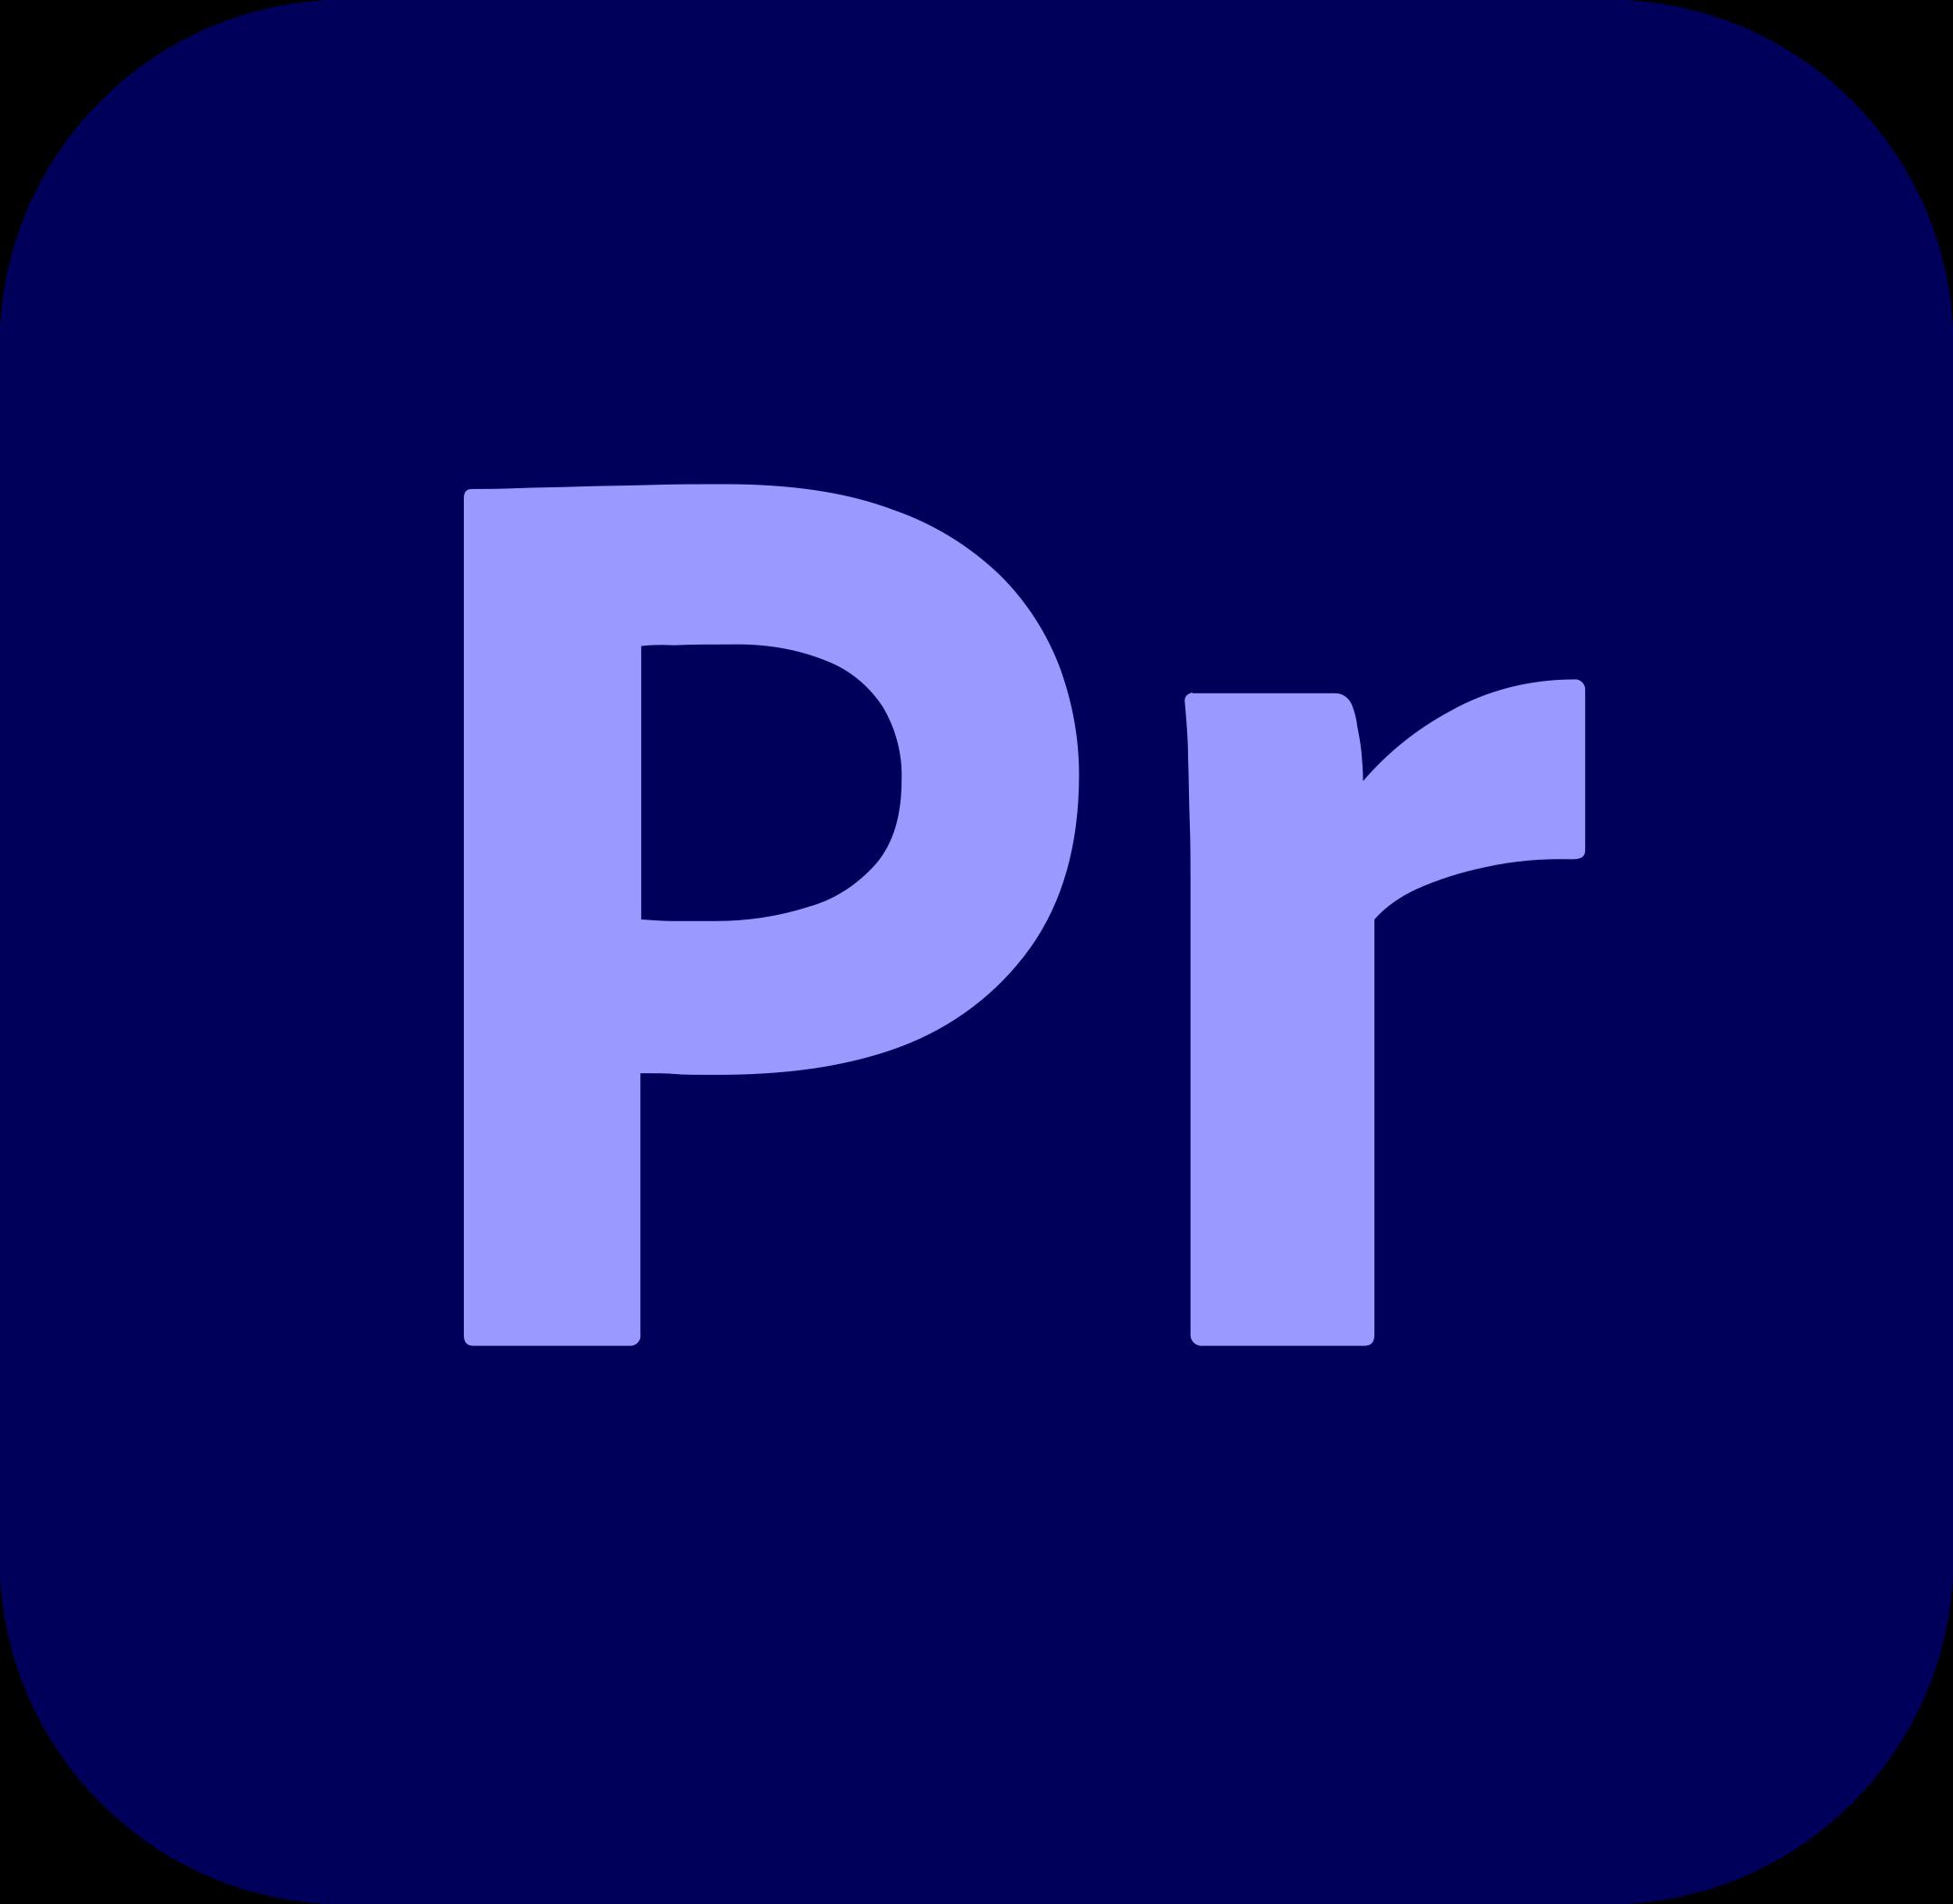 adobe premiere pro logo 1 1 - Adobe Premiere Pro Logo